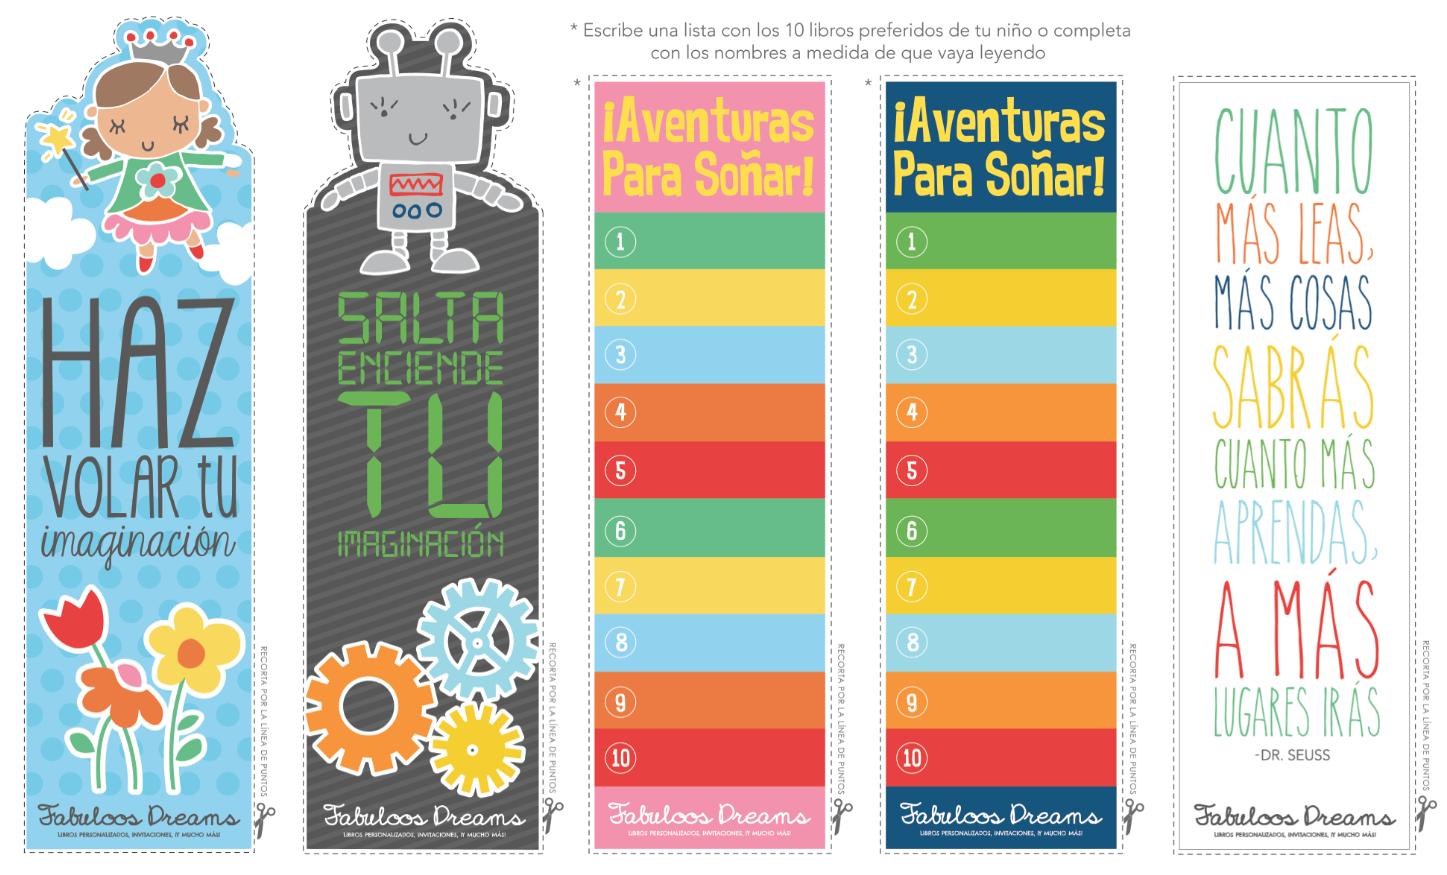 Plantillas Separadores De Libros Para Imprimir - Imagui @tataya.com.mx